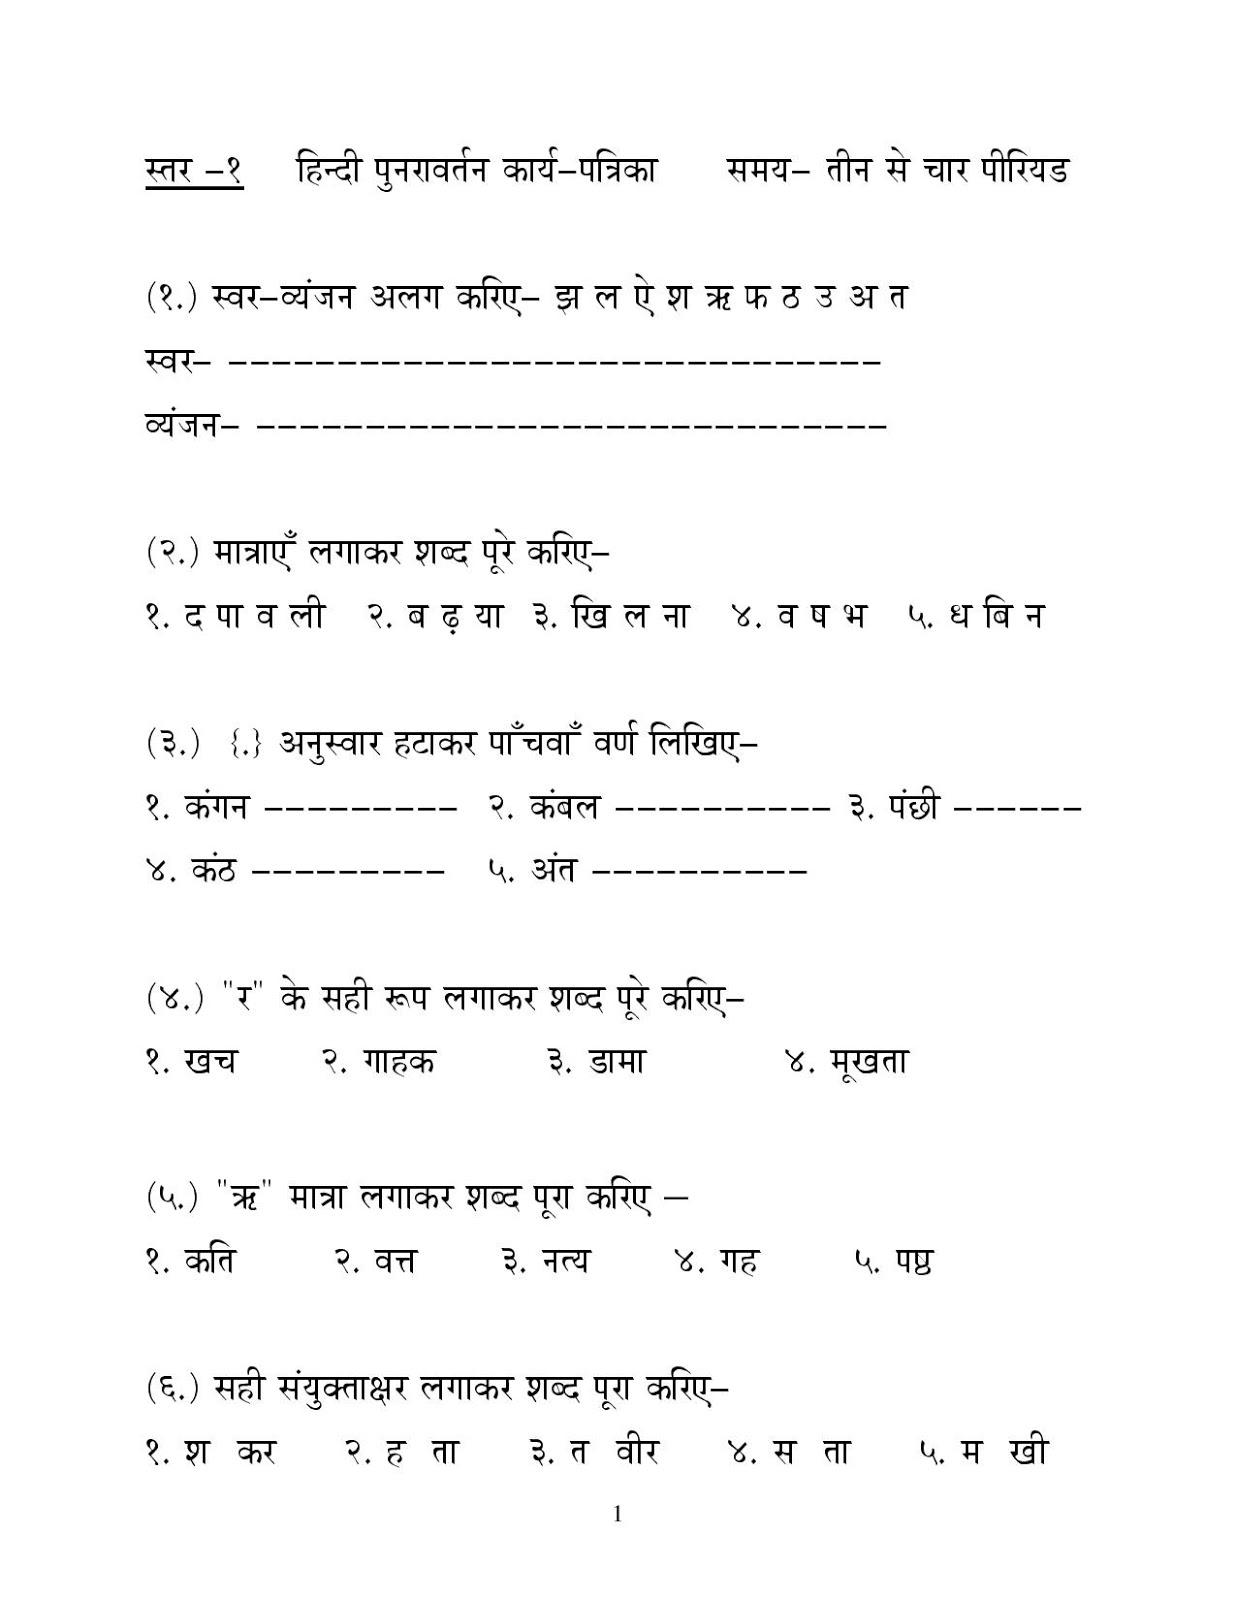 Worksheet Of Hindi For Class 5 Breadandhearth